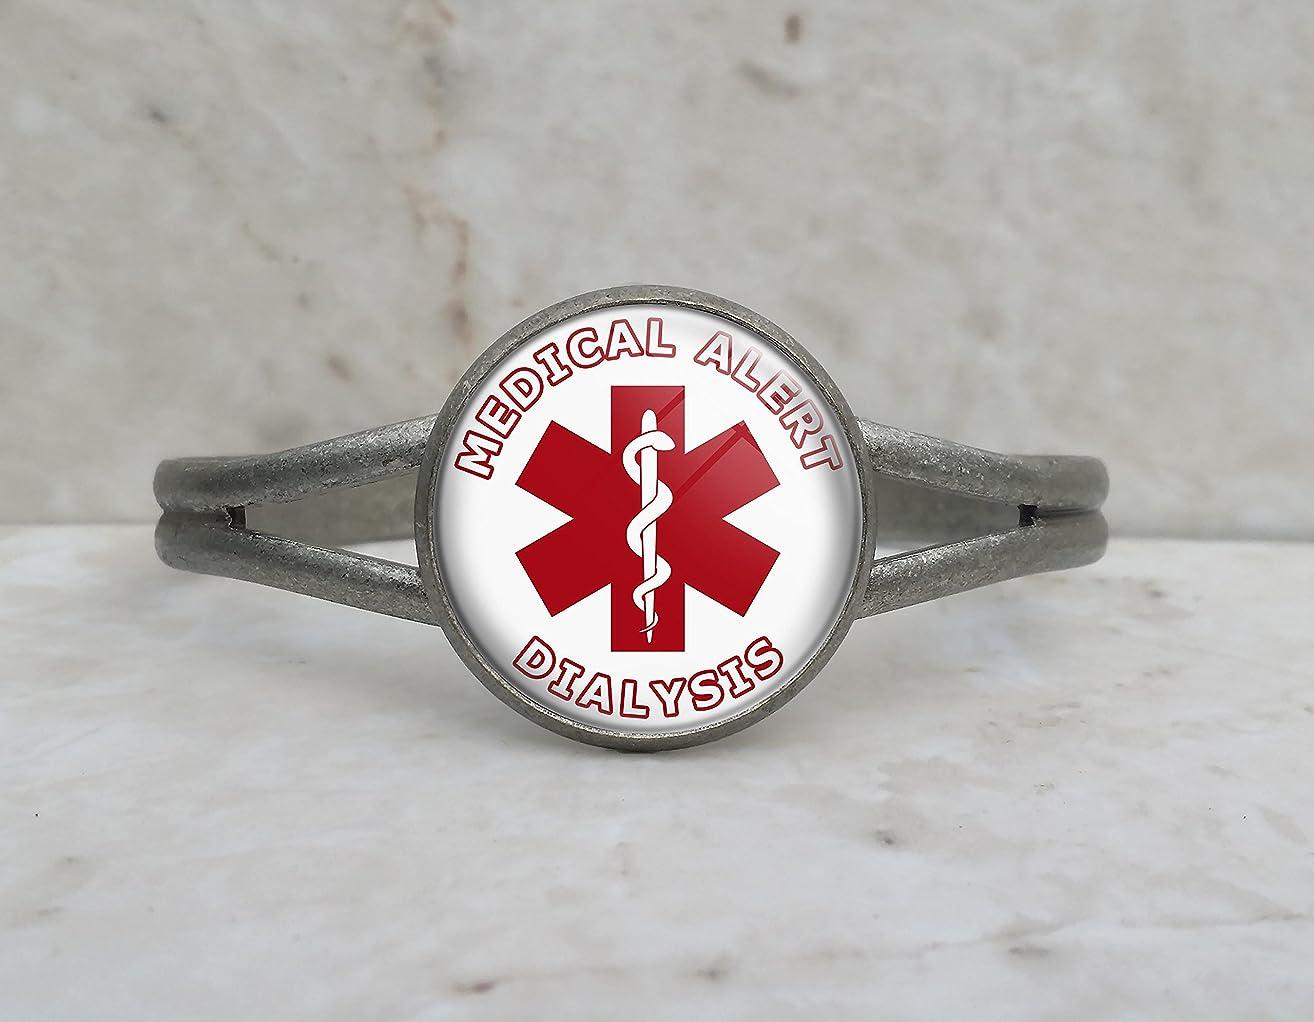 Medical Alert Dialysis Cuff Bracelet